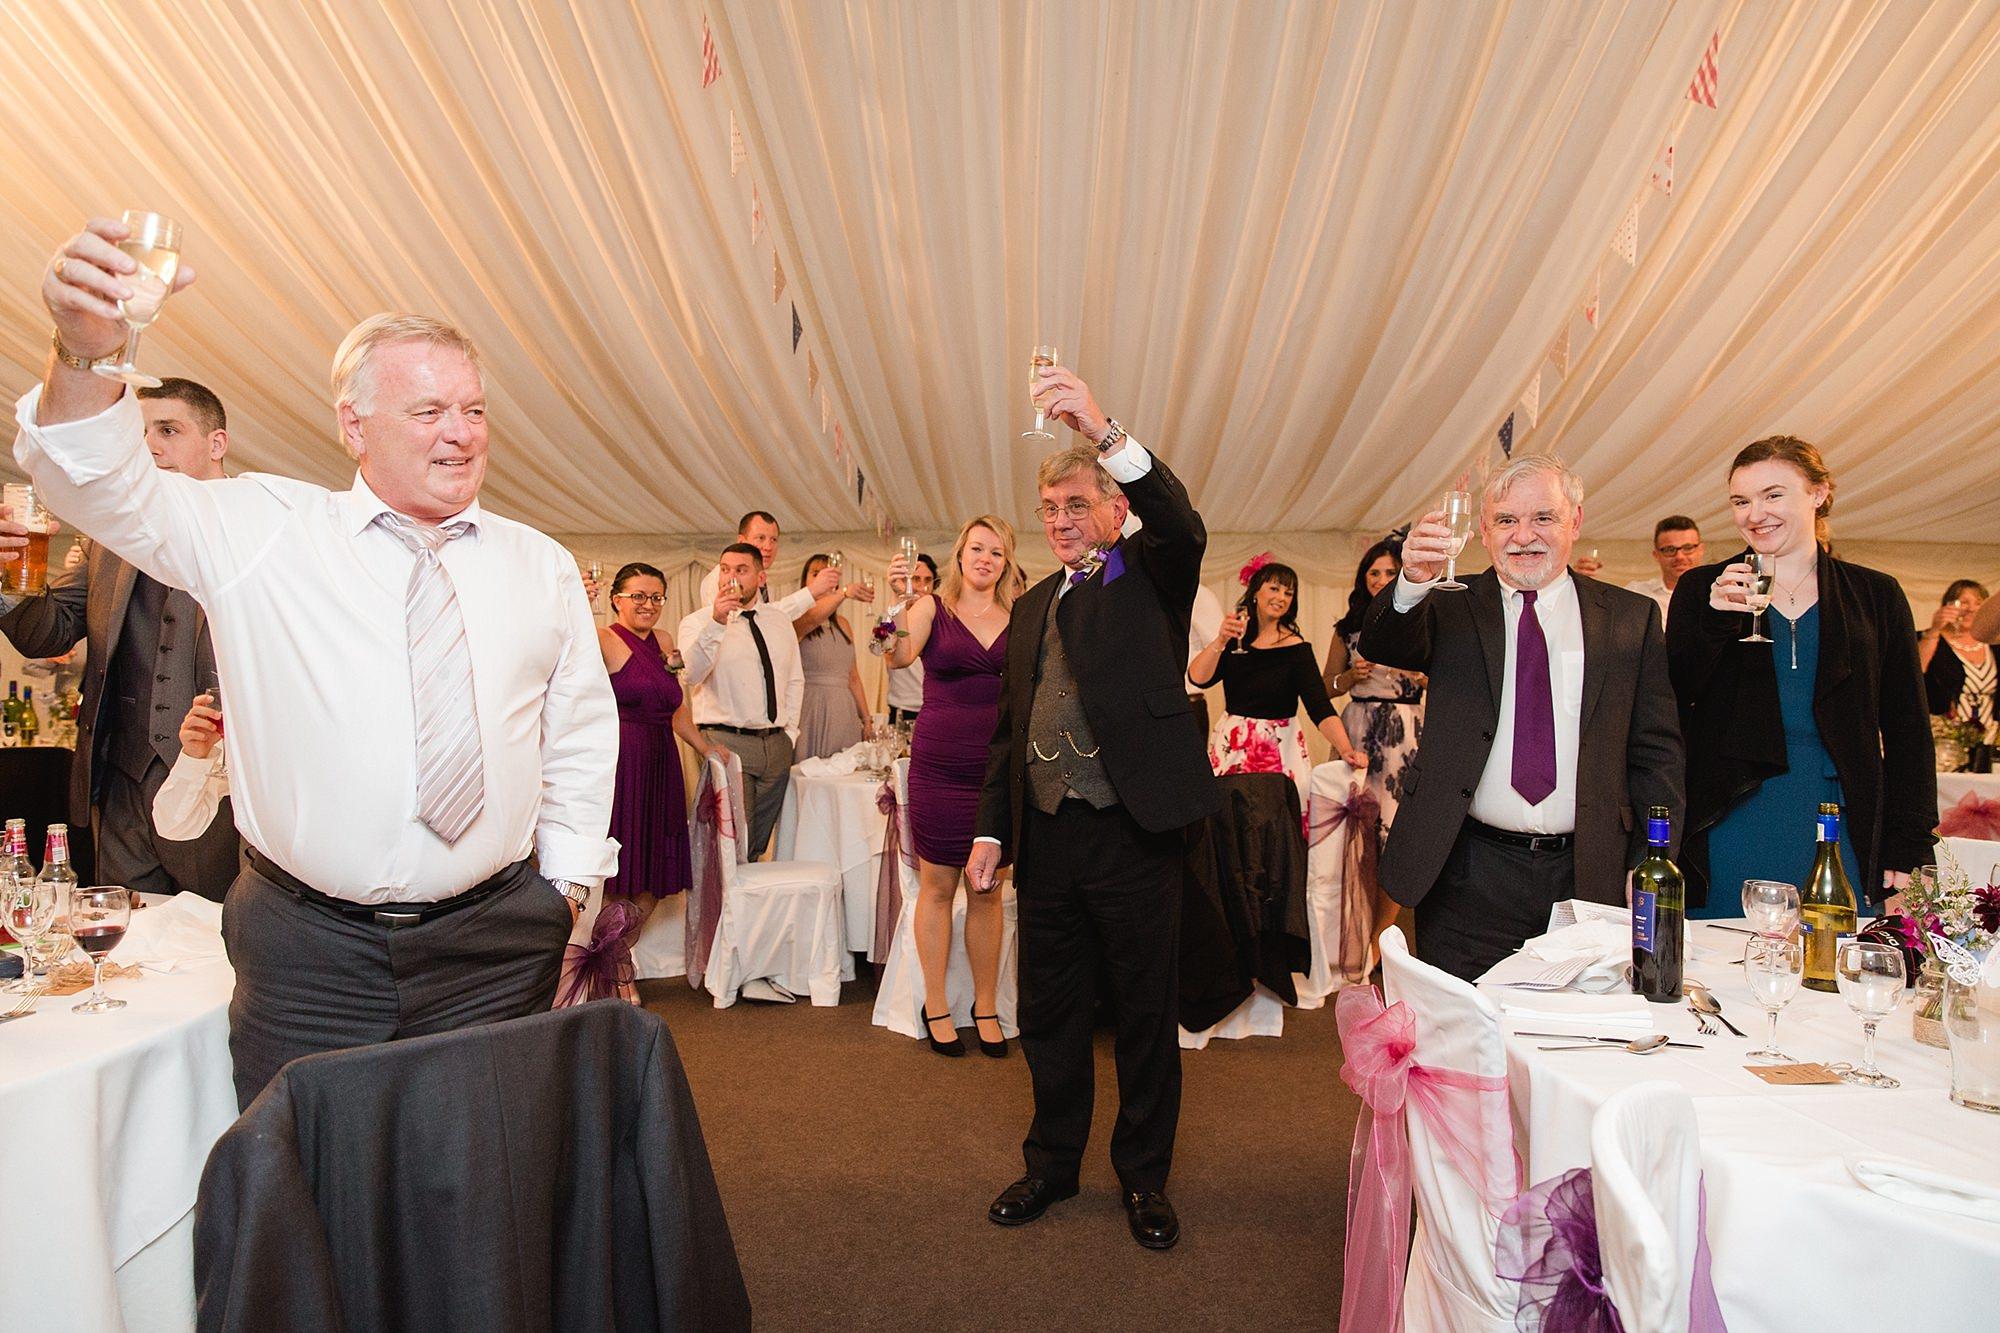 A fun wedding at last usaf father of groom toast